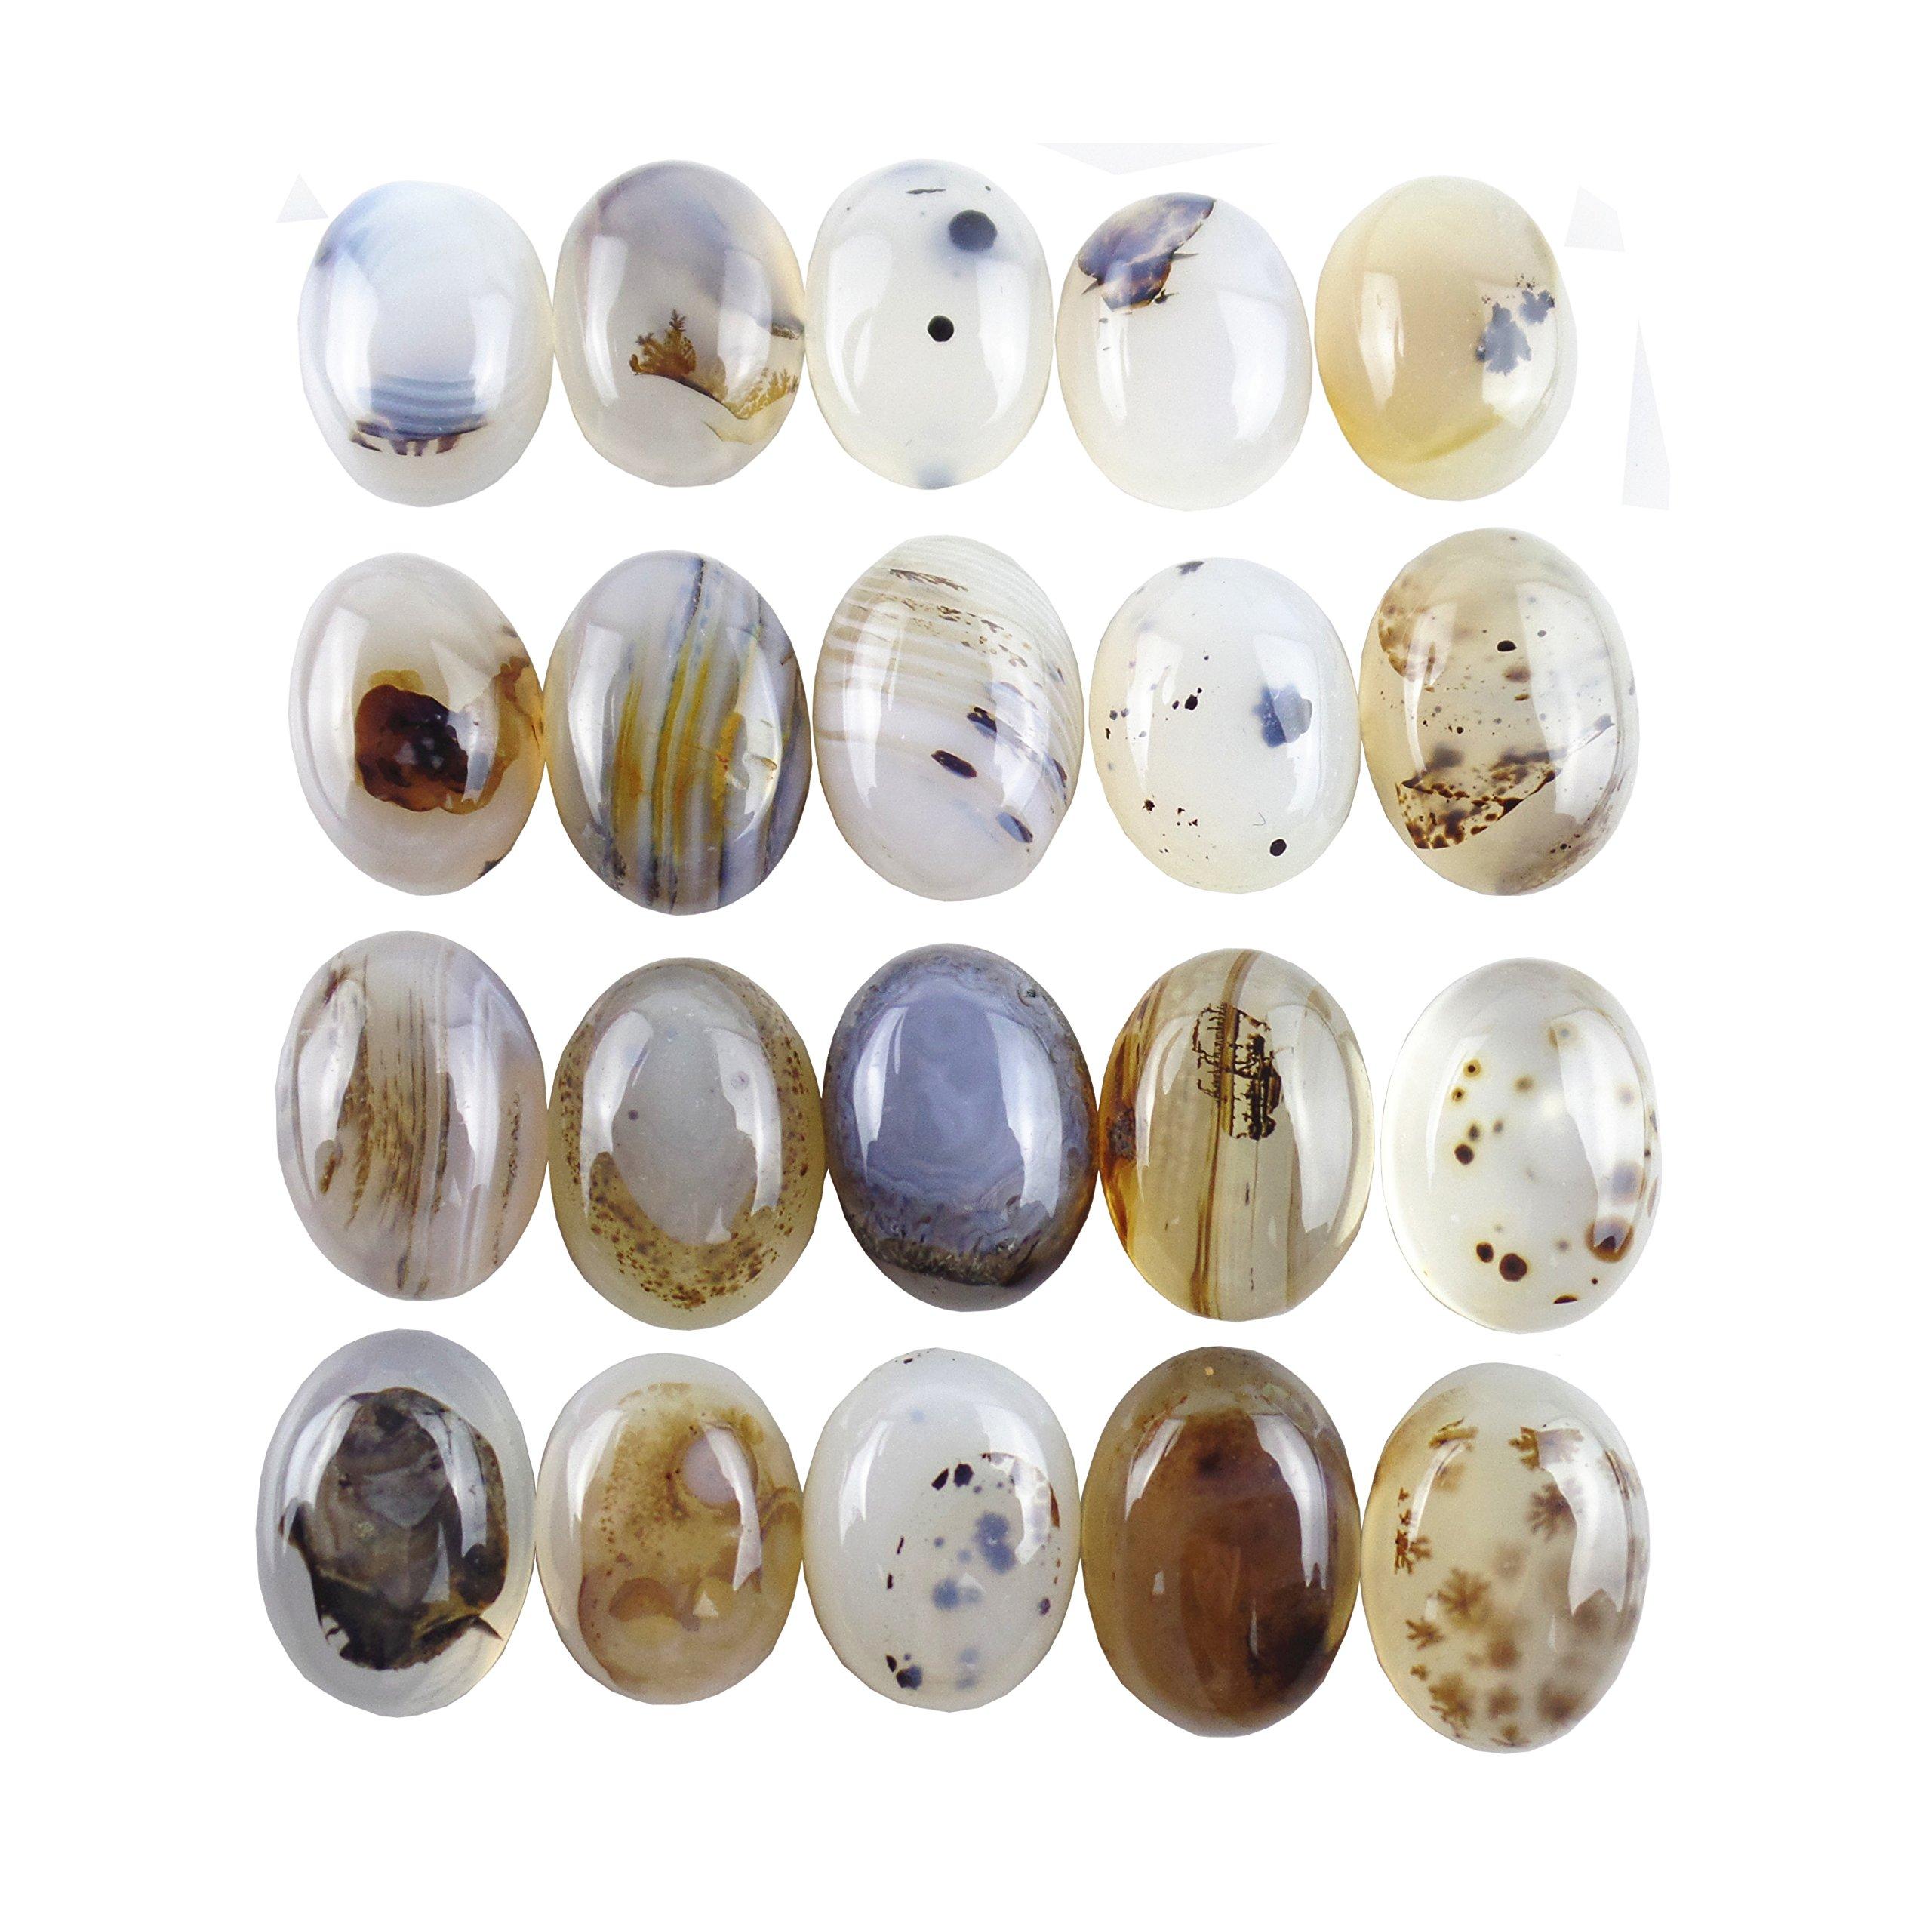 JCGJ Cabochon Oval Stone,20Pcs Unisex Semi-Precious Gemstone for Jewelry Making